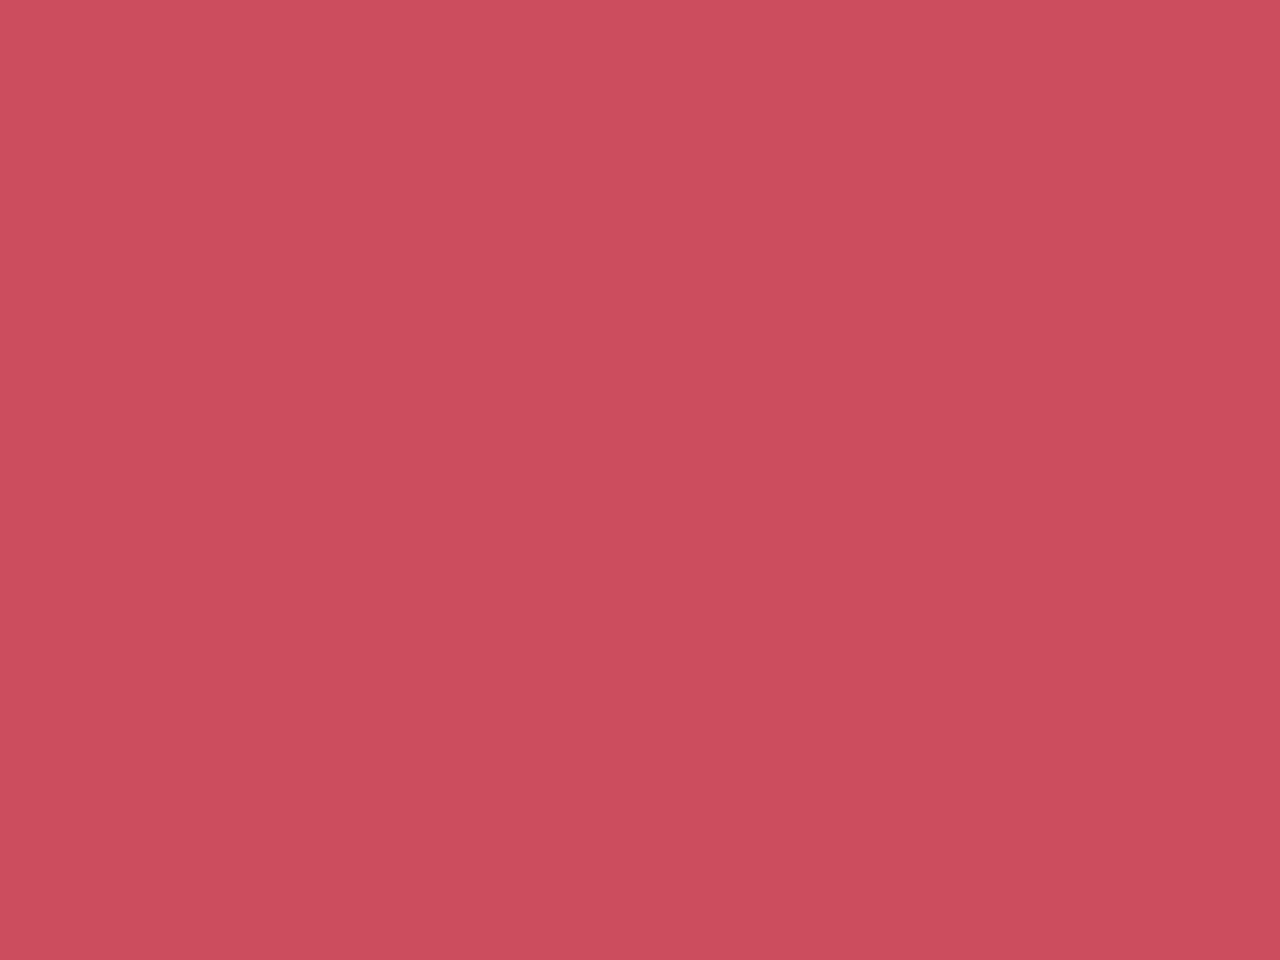 1280x960 Dark Terra Cotta Solid Color Background